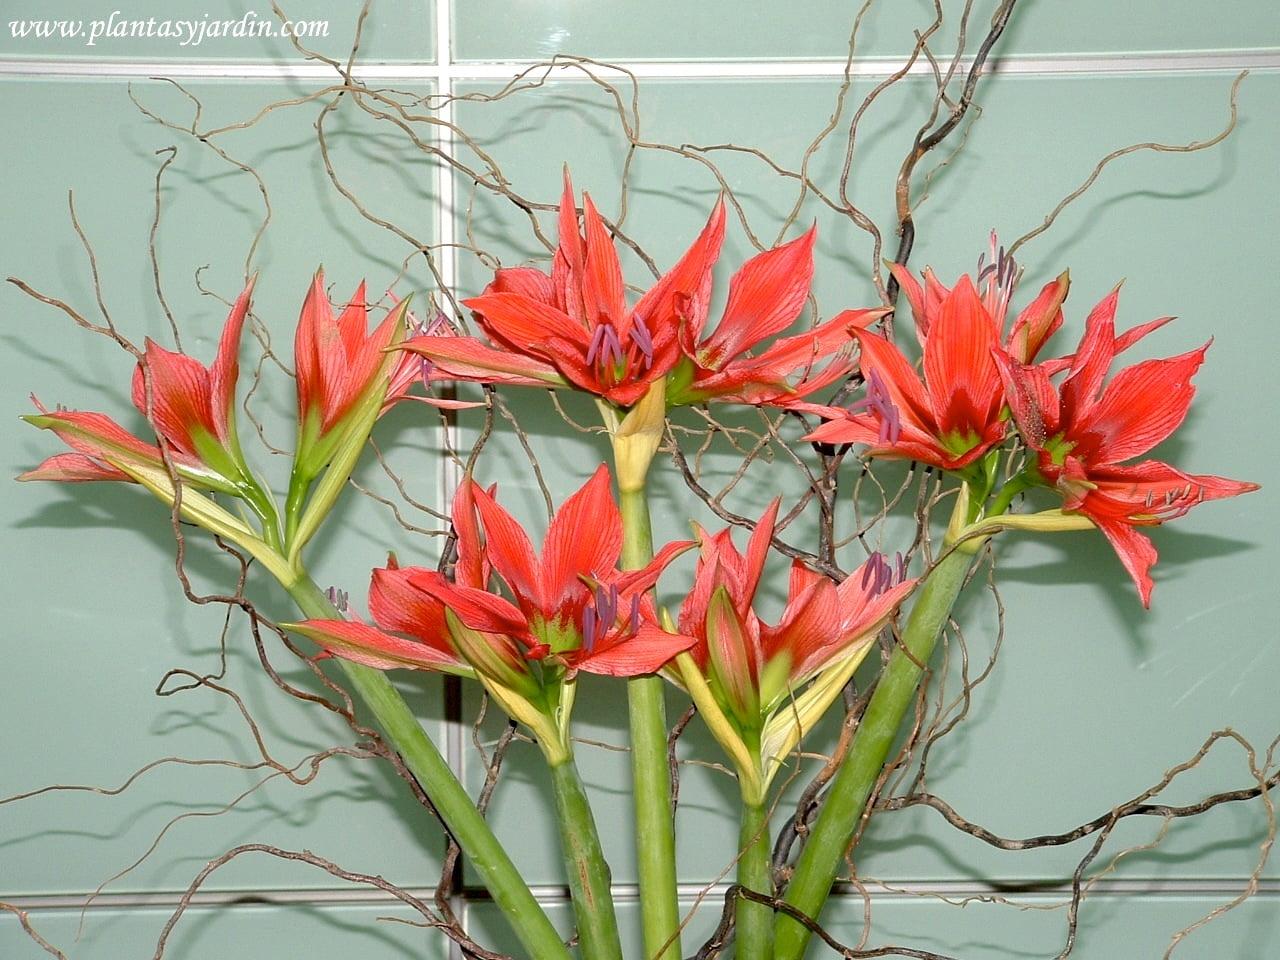 Amaryllis sinomimo de Hippeastrum en bouquet floral con Sauce electrico